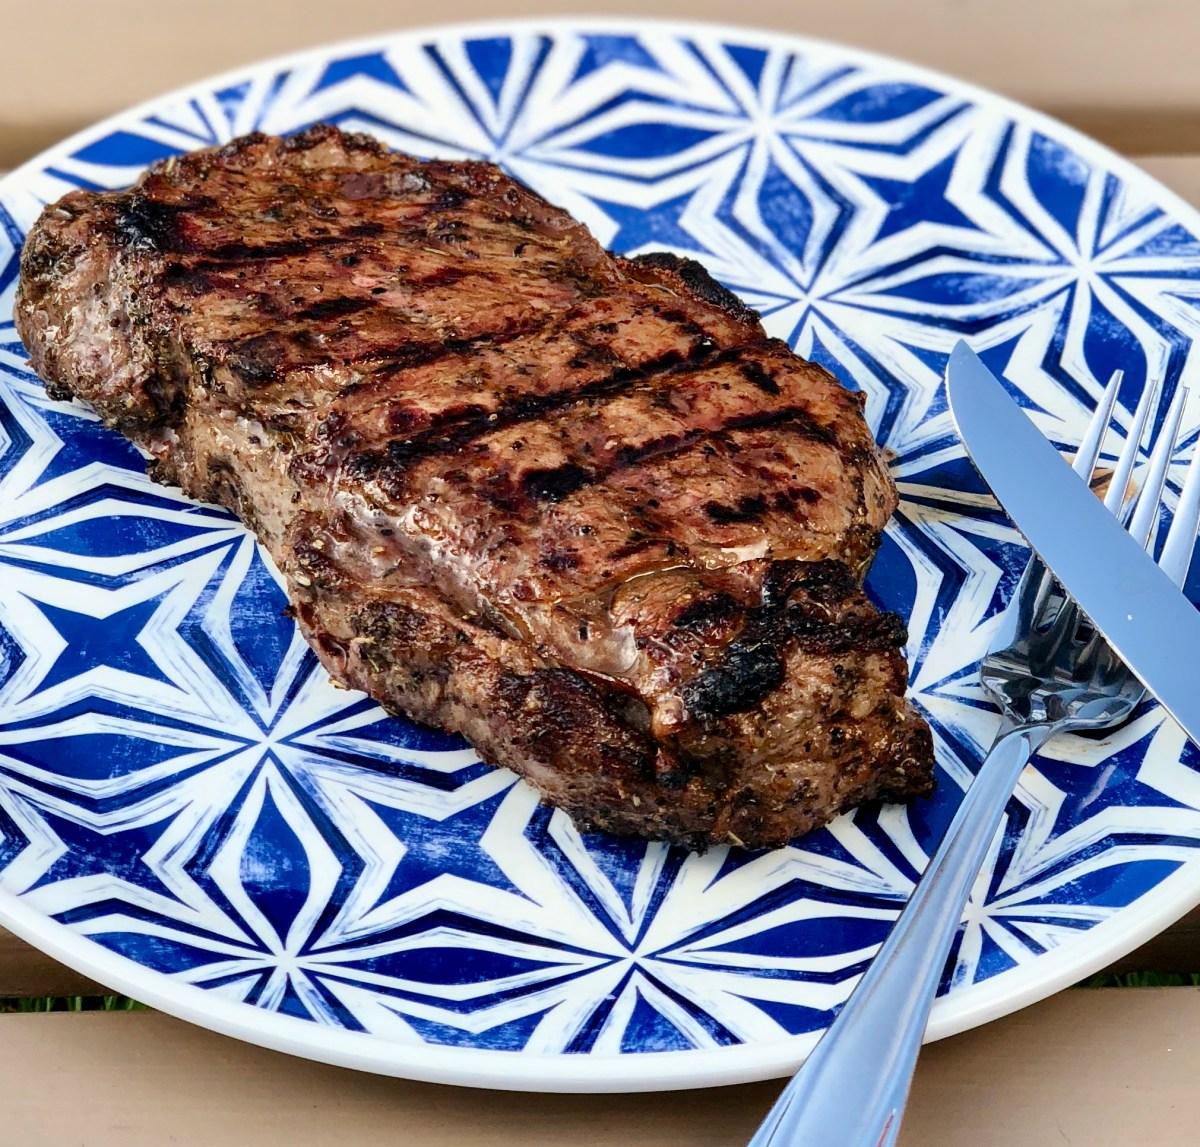 My All Time Favorite Steak Marinade! by Happylifeblogspot.com #steak #grilledsteak #steakmarinade #howtogrillasteak #marinadeforsteaks